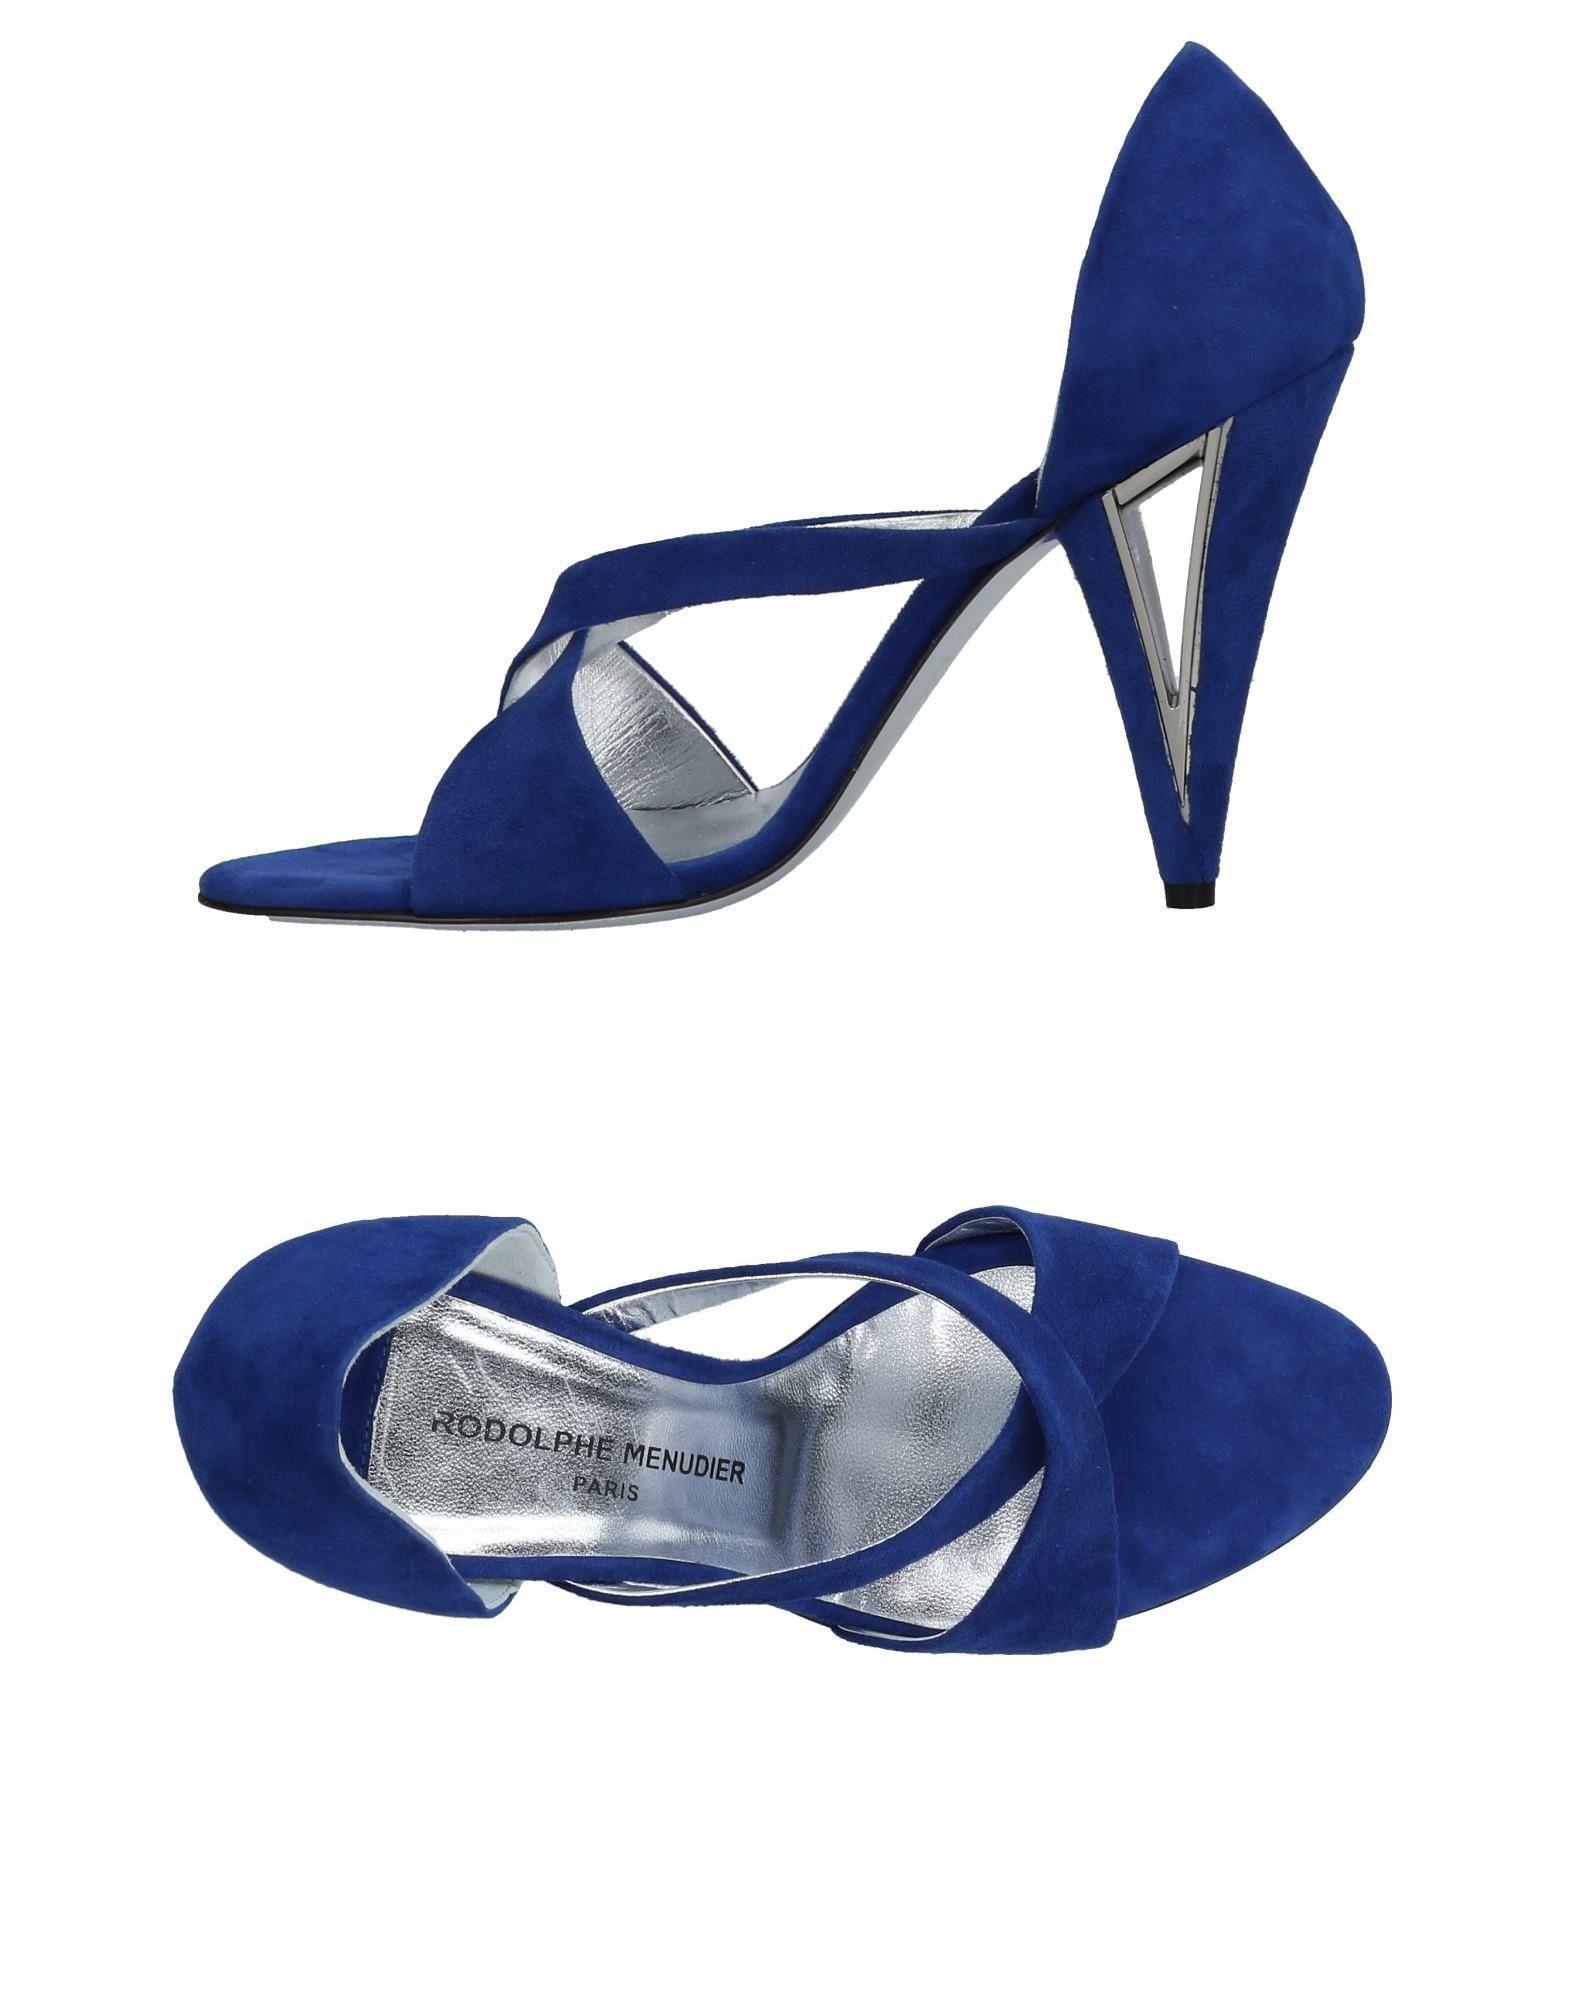 RODOLPHE MENUDIER Sandals cheap sale largest supplier perfect VsMyAQOtQr